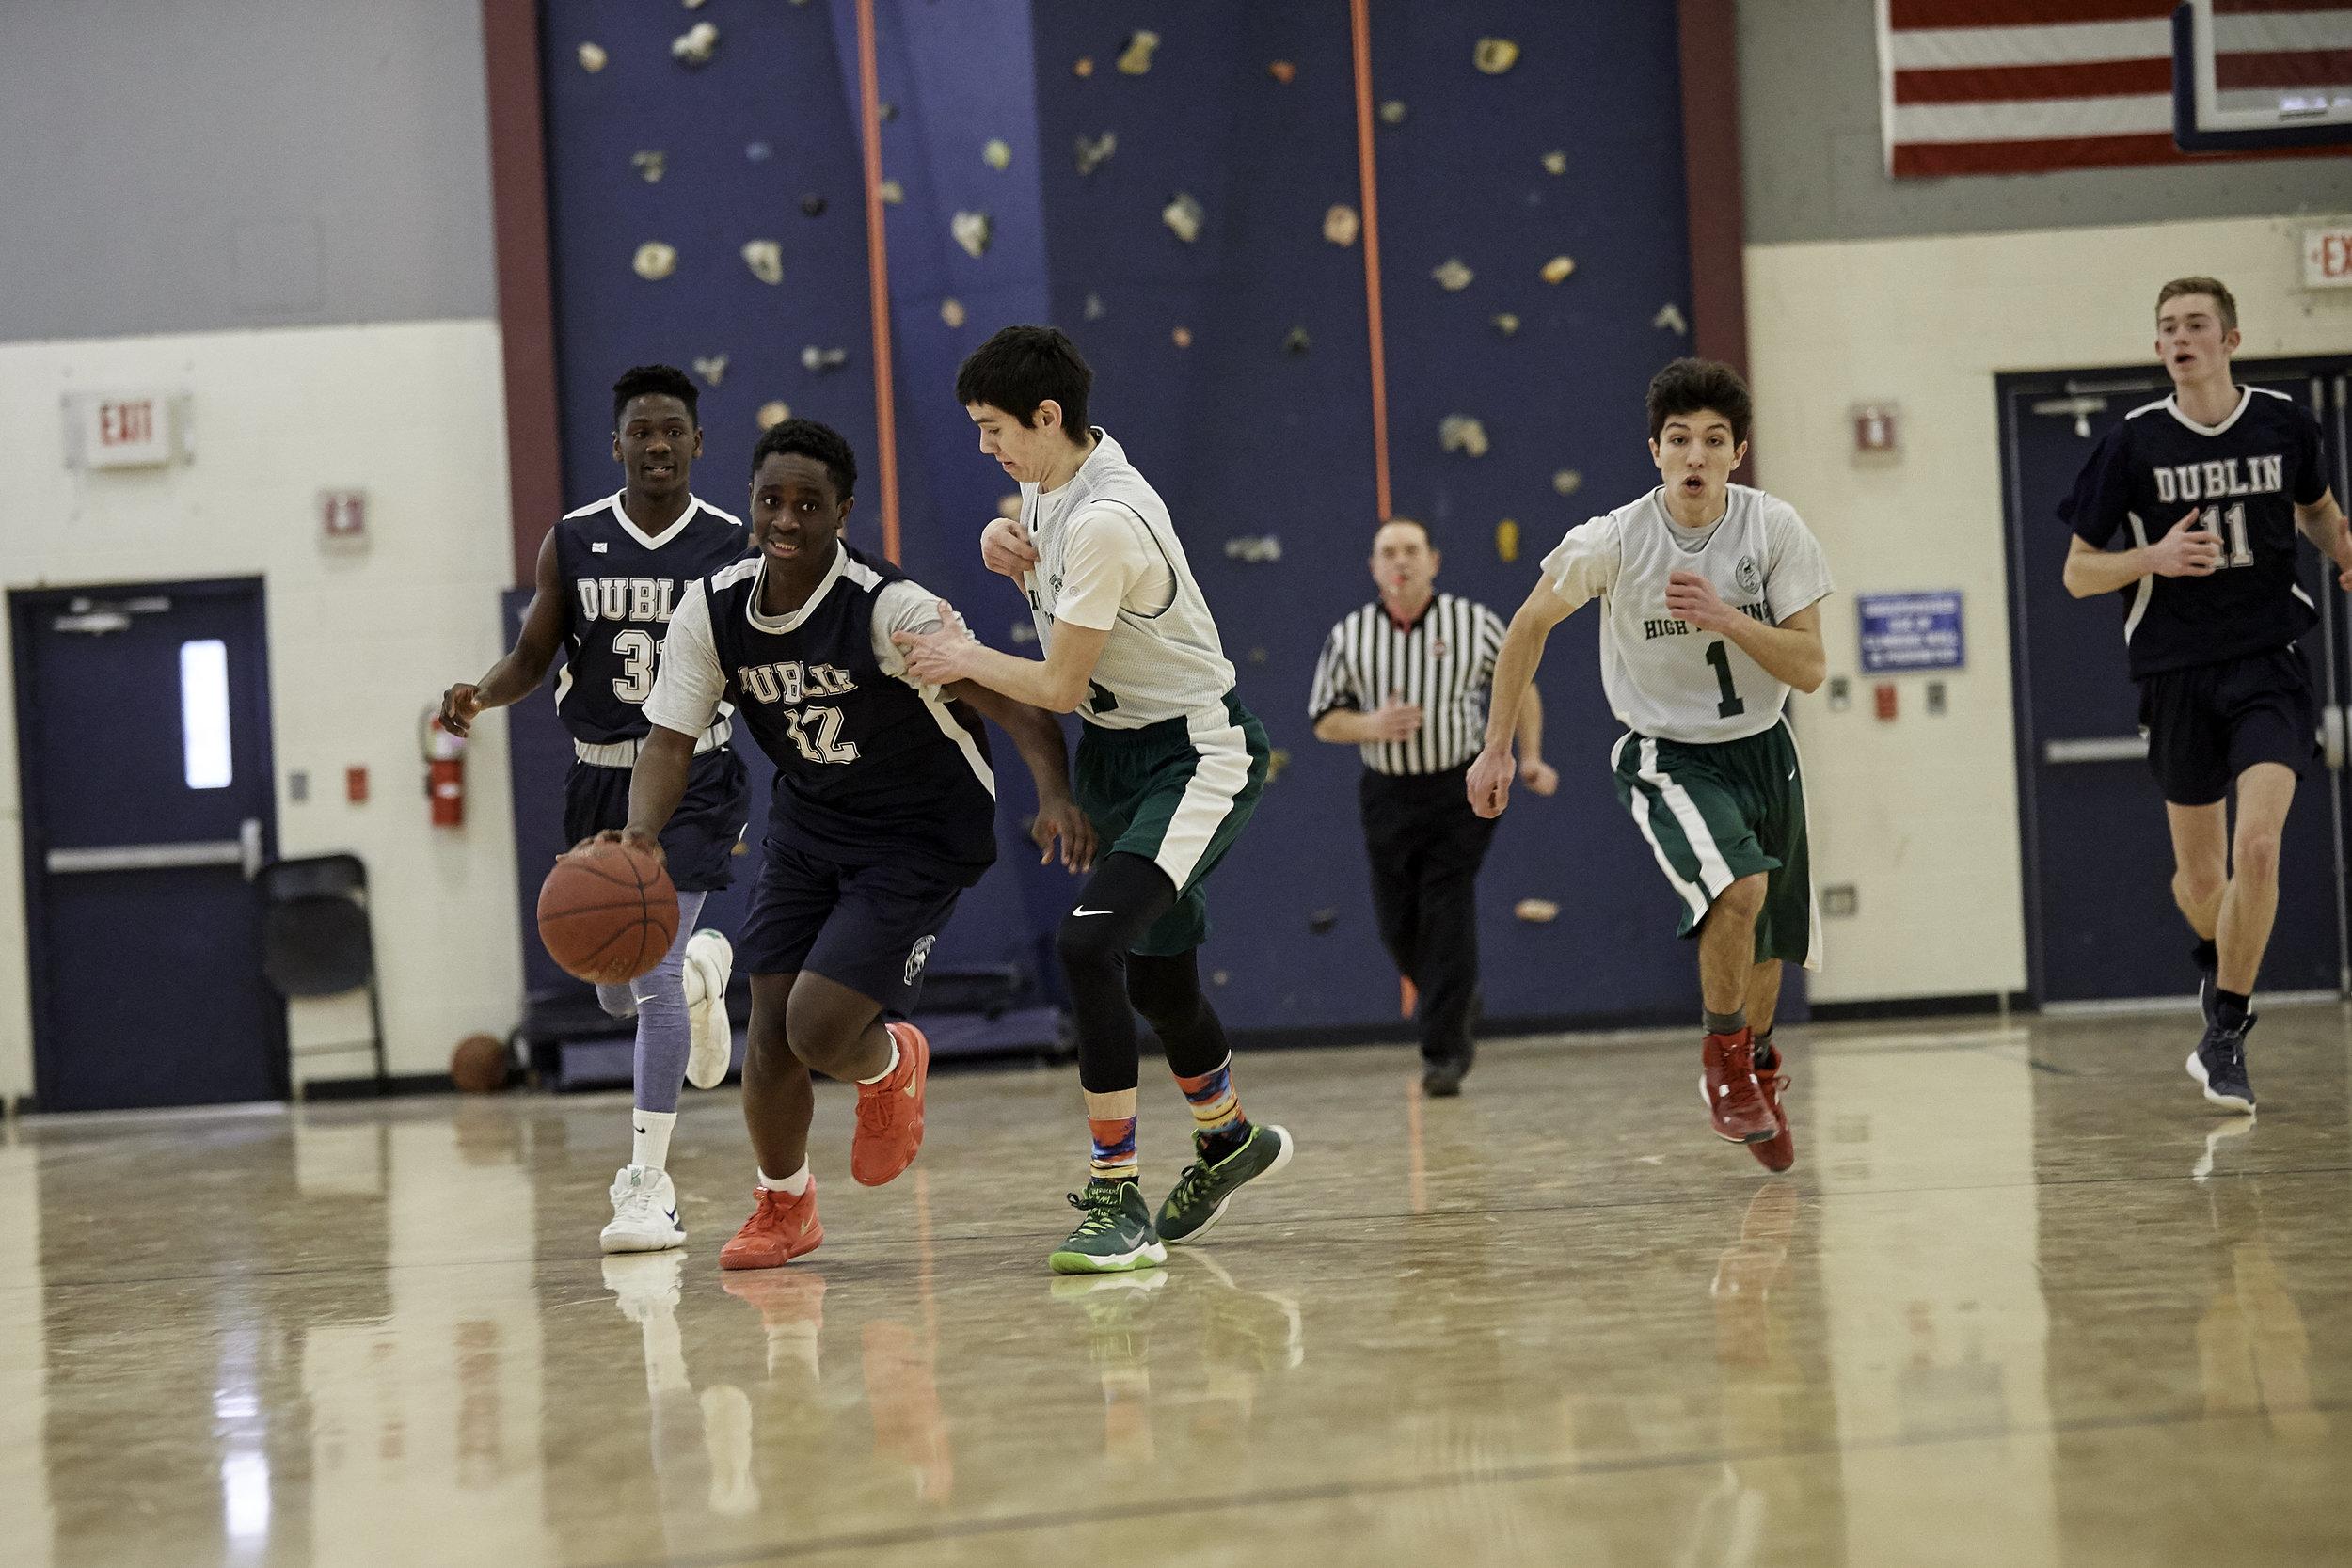 Boys Varsity Basketball vs High Mowing School - Feb 02 2019 - 0018.jpg